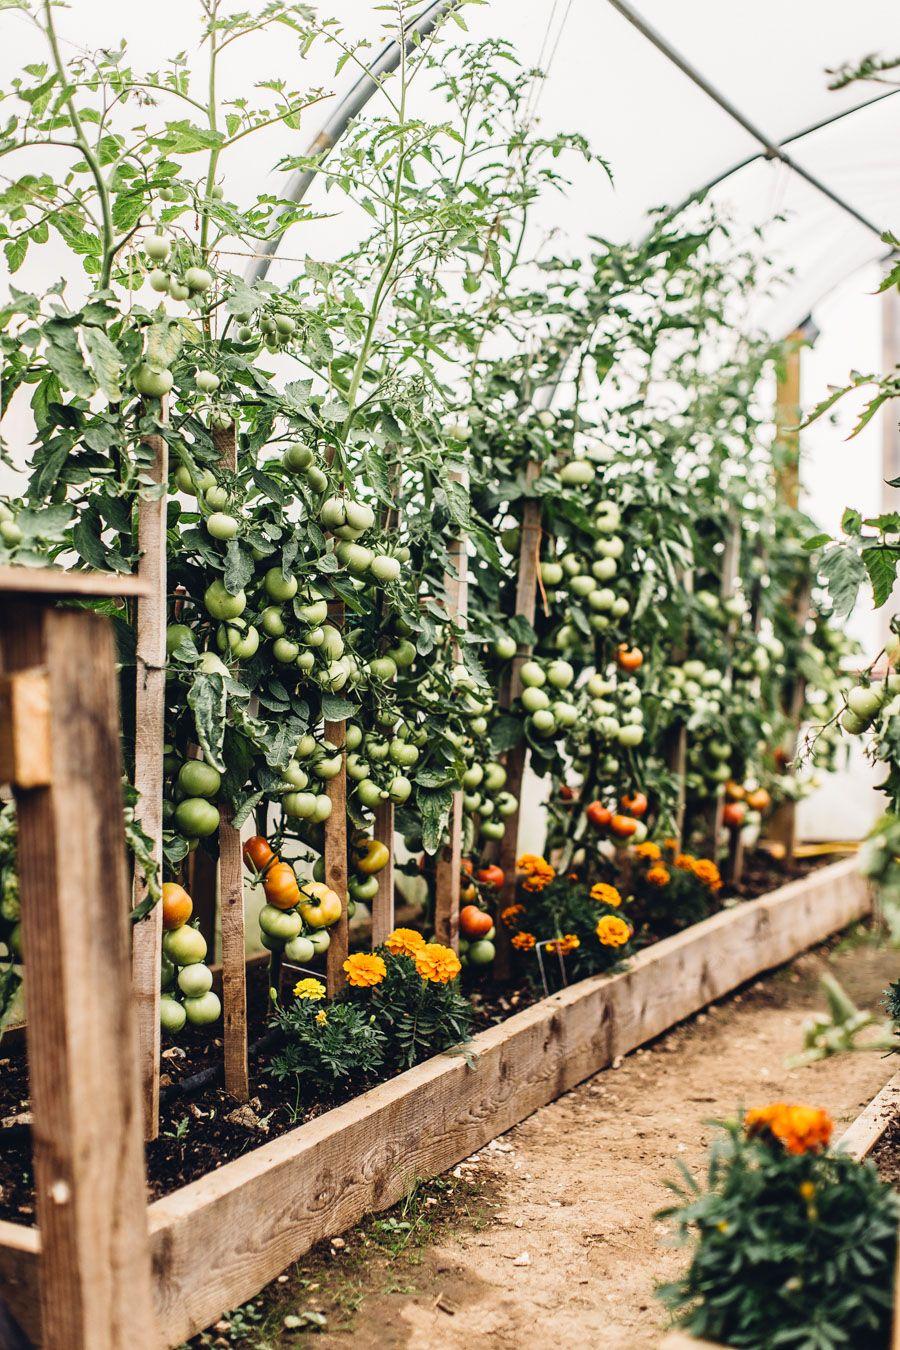 HILL VIEW FARM - CREATIVITY FESTIVAL 2018 | Vegetable ...